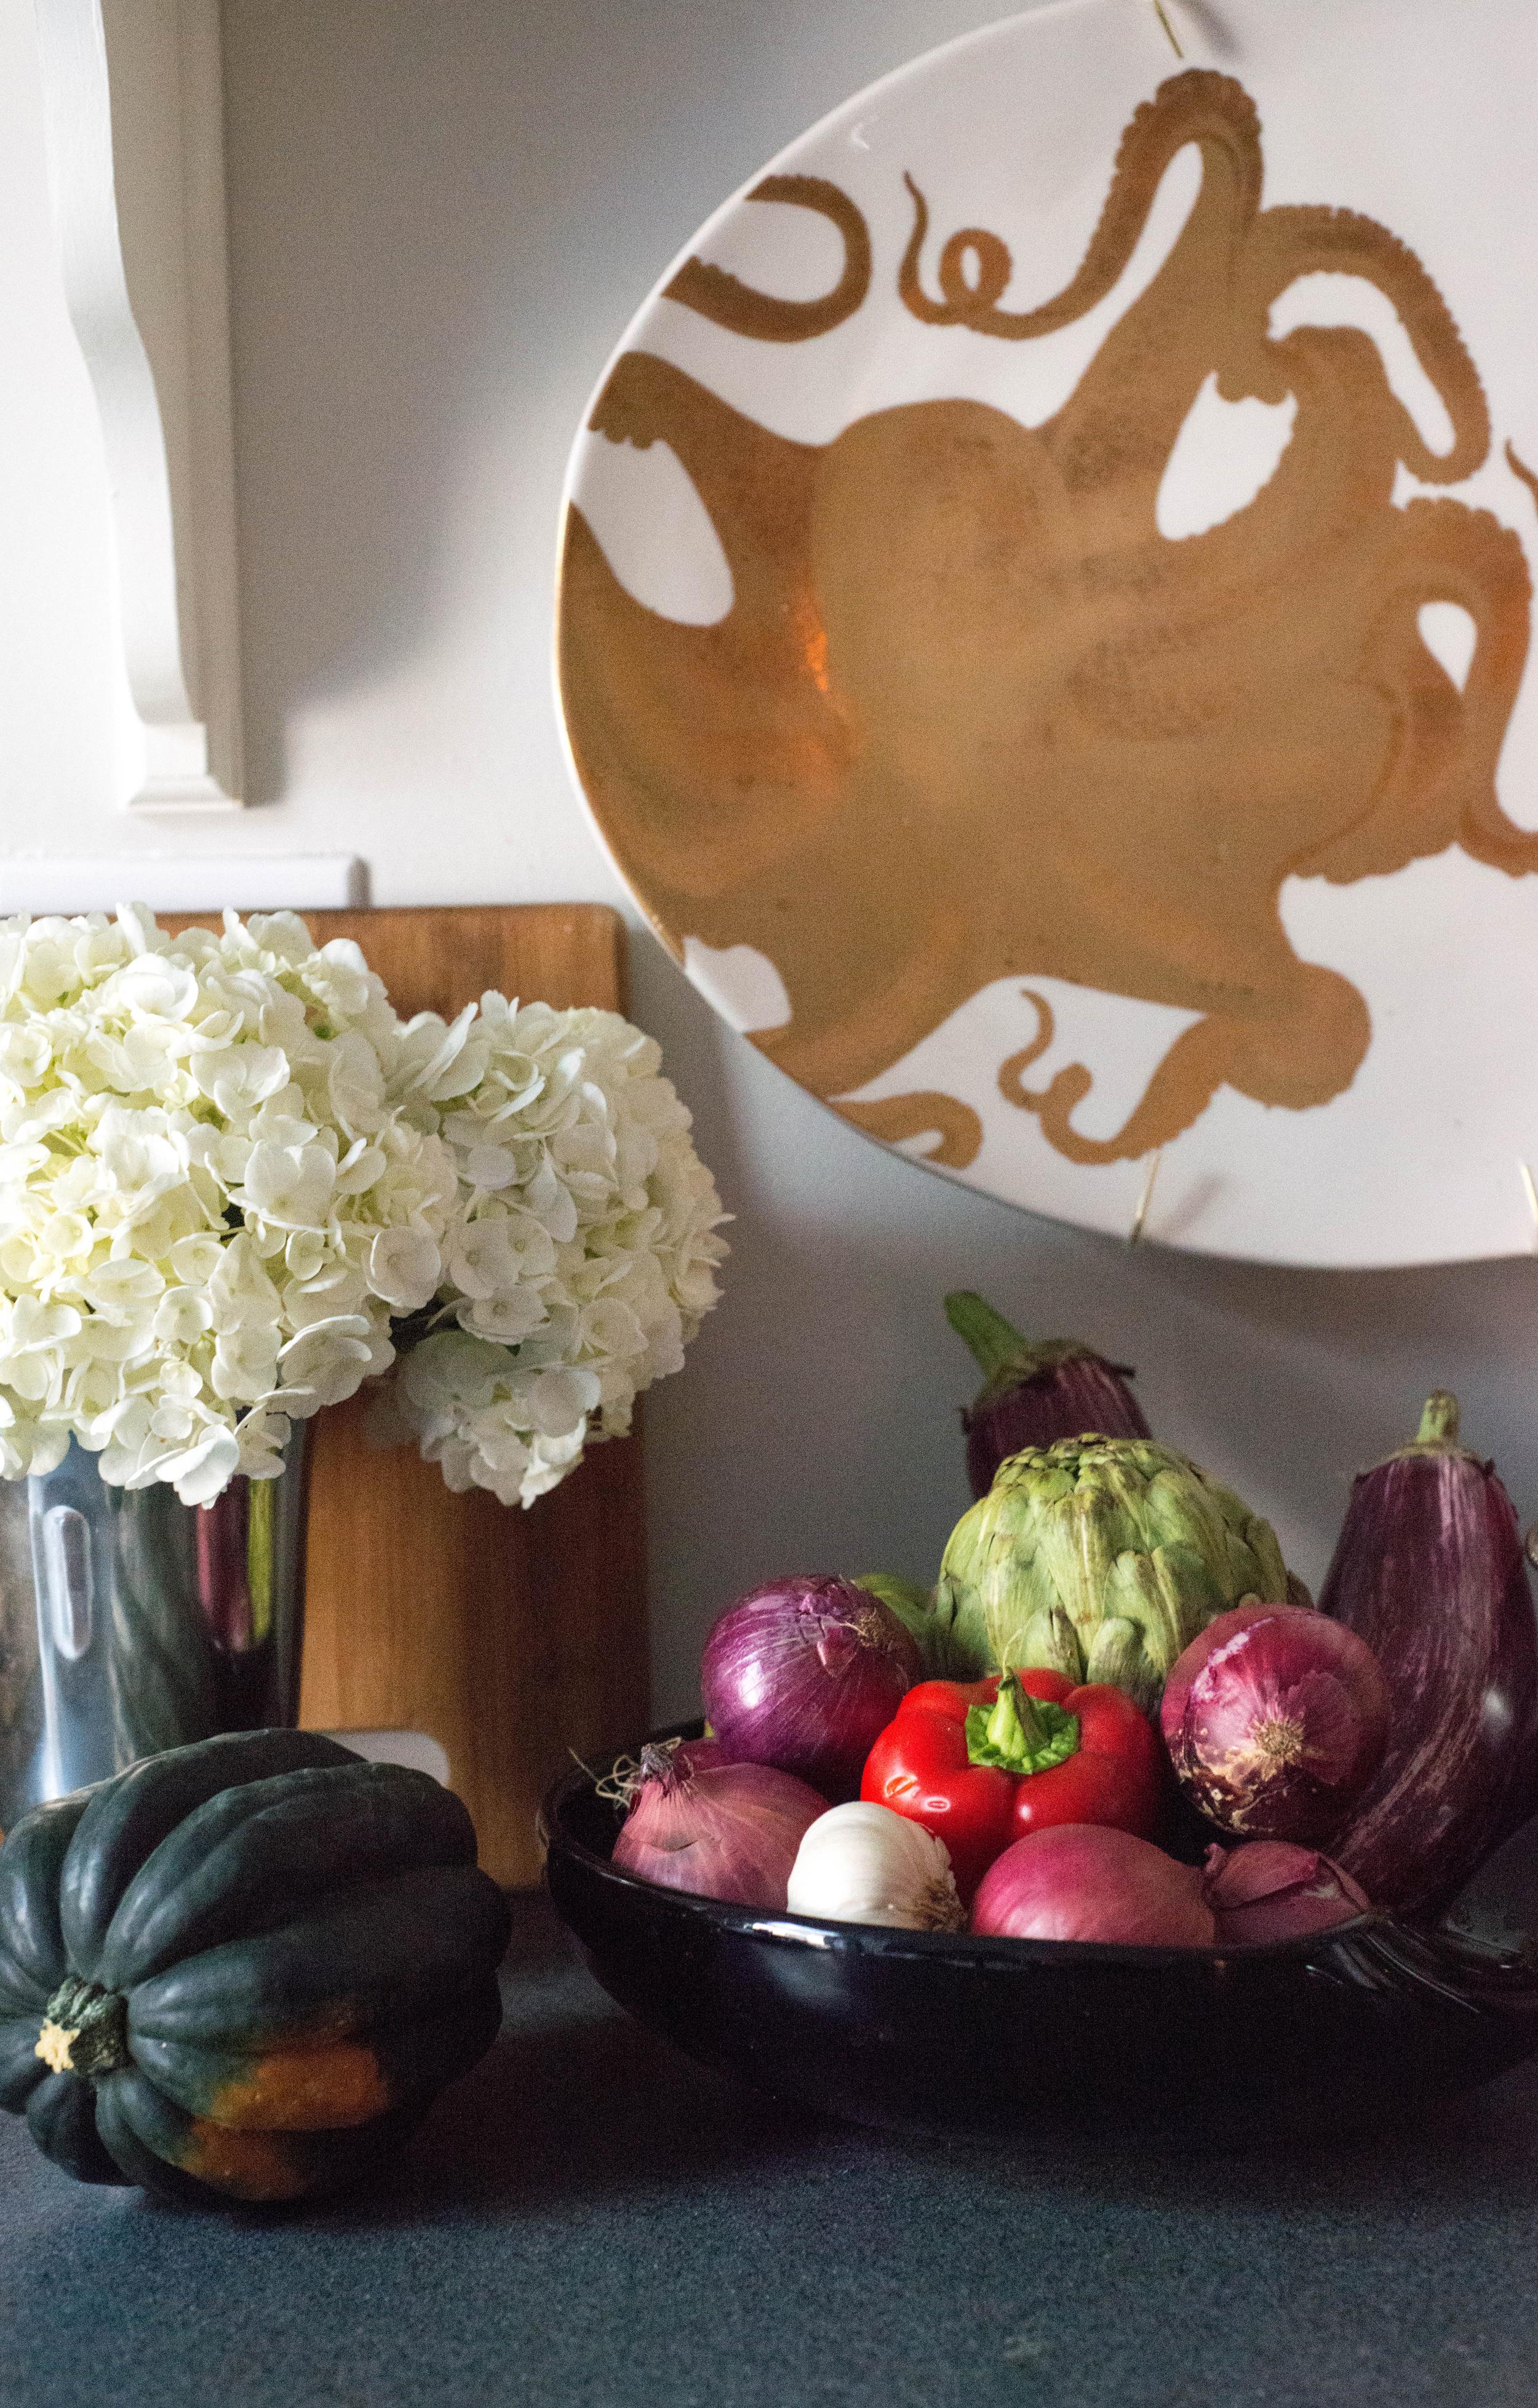 Brooklyn Galley Kitchen | Open Shelves |  By: Lauren Caron © Fourth Floor Walk Up 2015